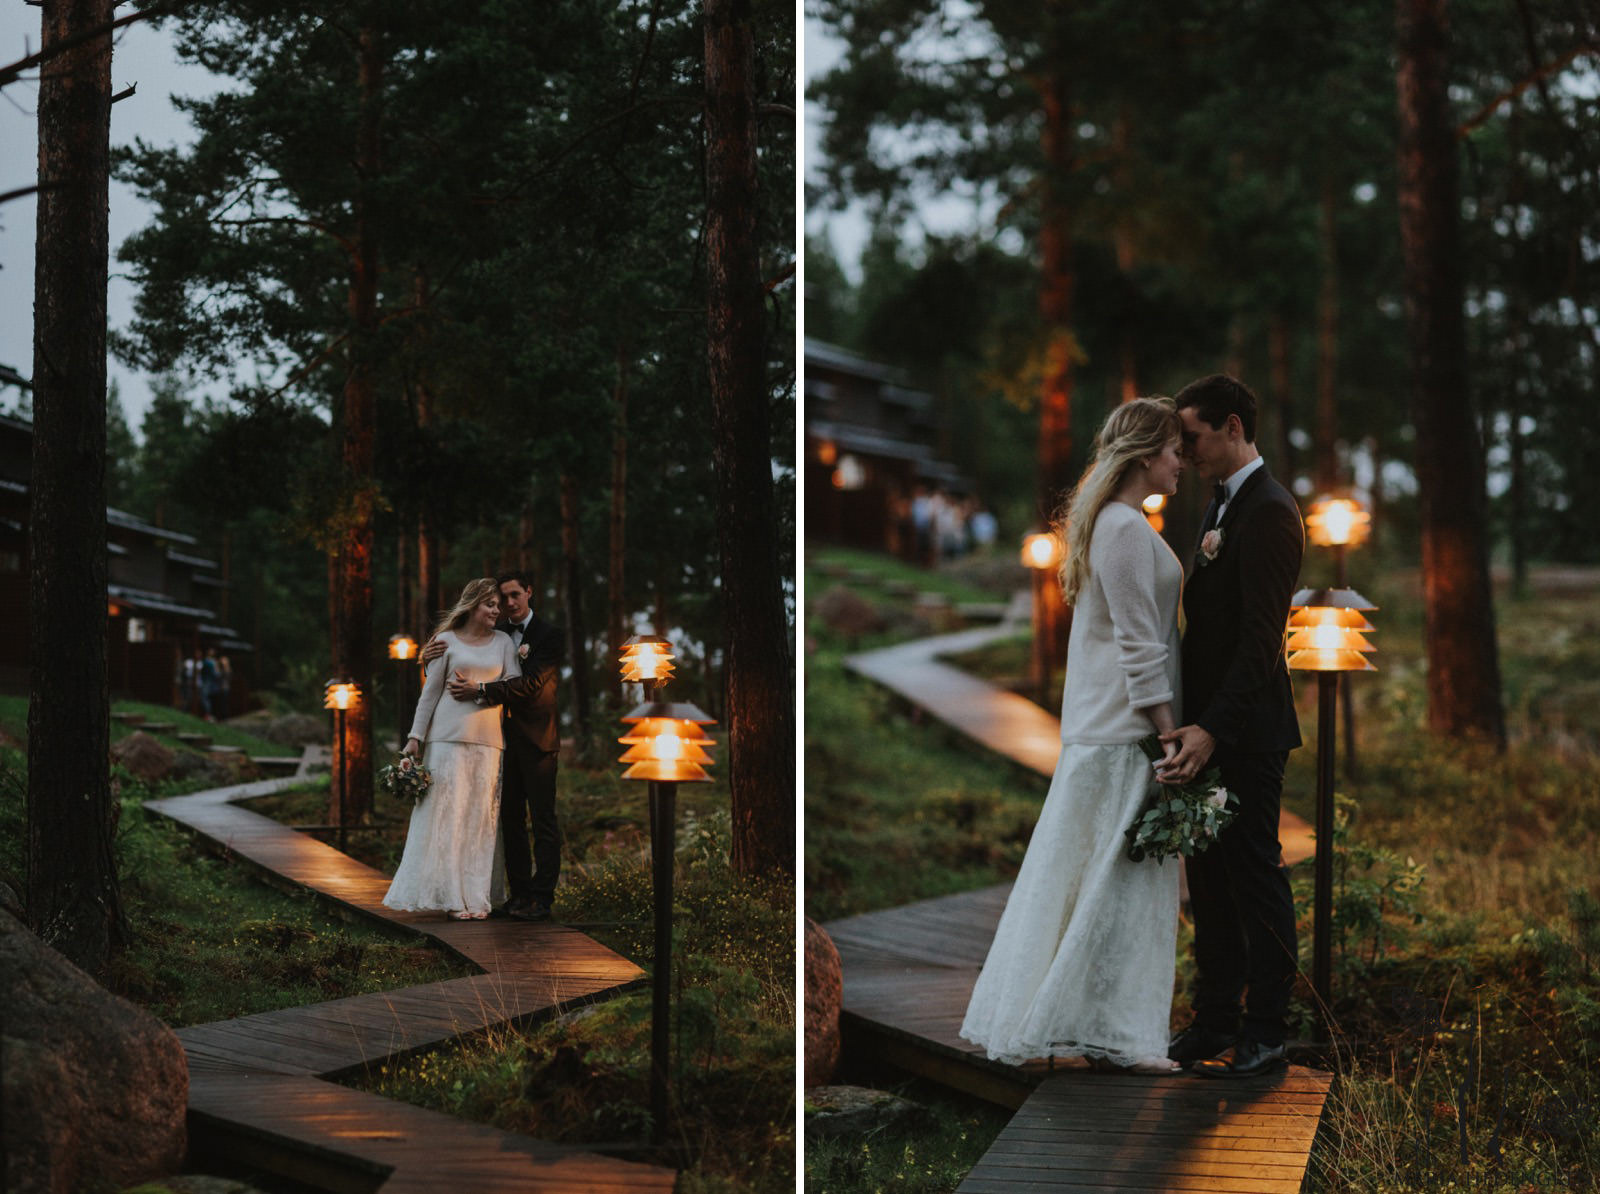 night wedding in Finland